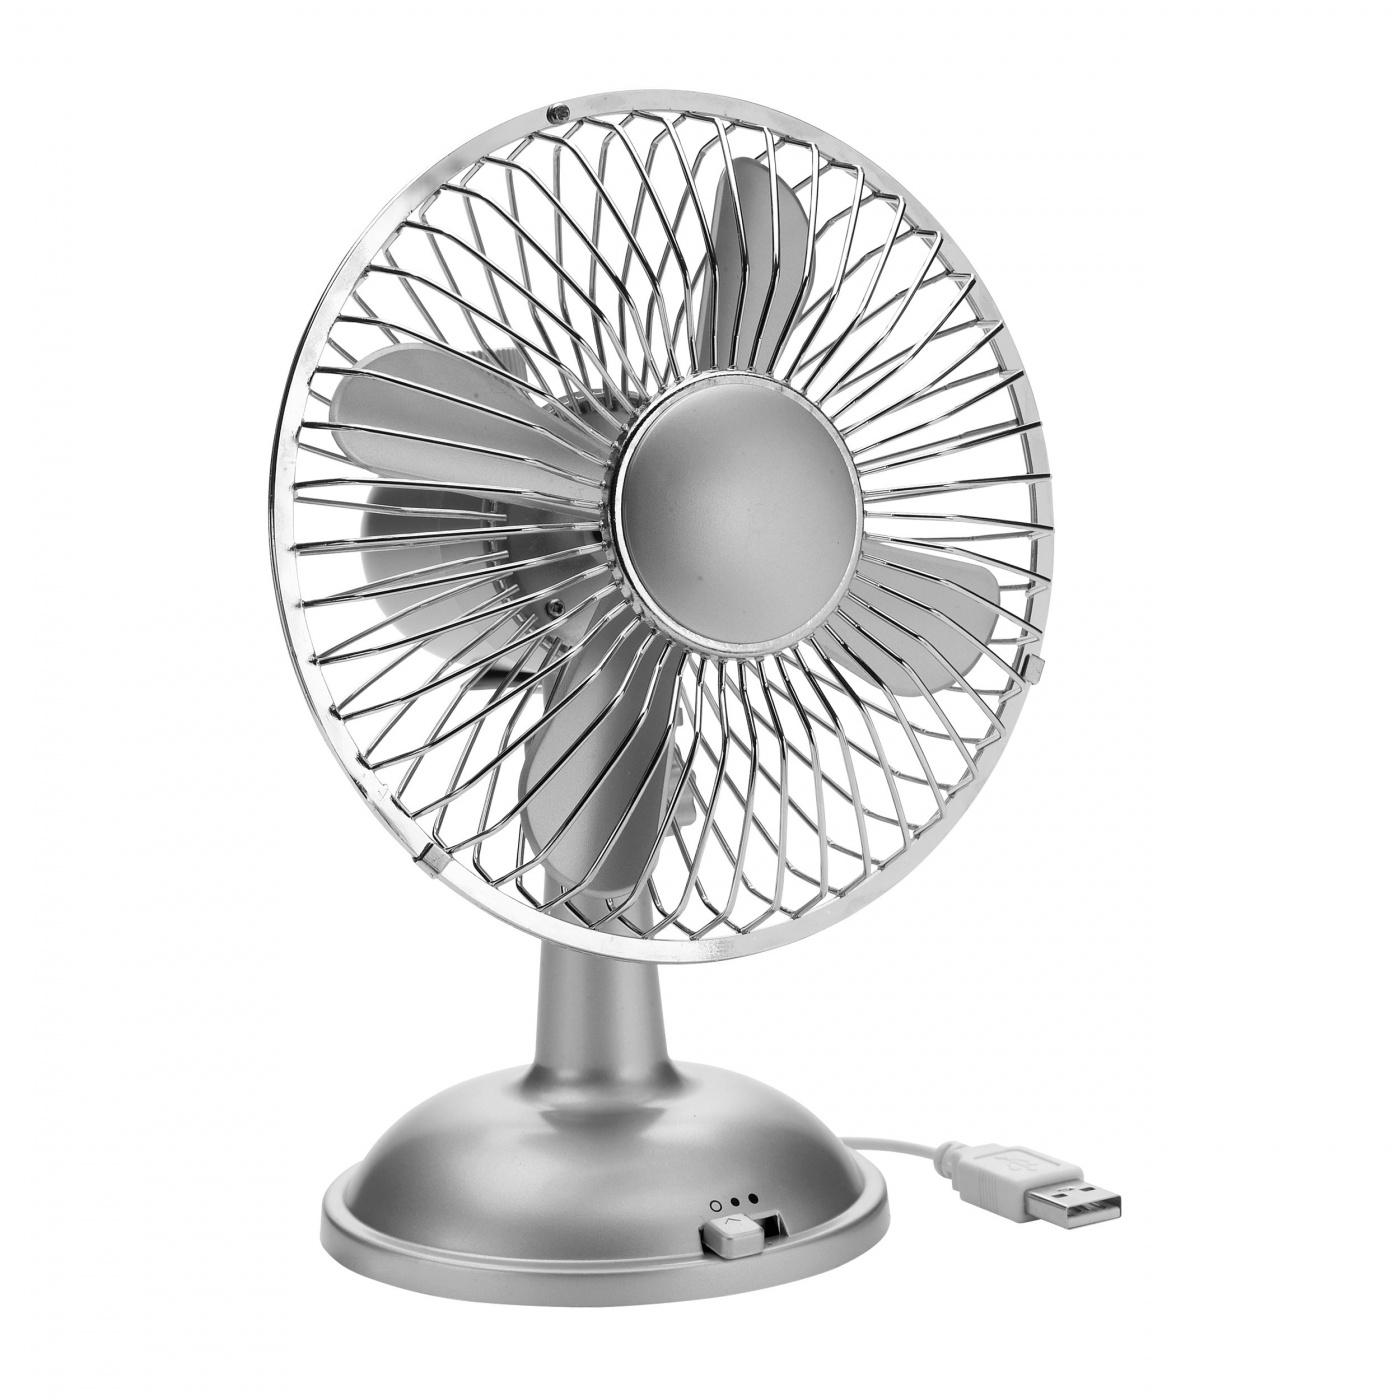 ventilator l fter usb batterie unterwegs pc laptop b ro 14 cm silber ebay. Black Bedroom Furniture Sets. Home Design Ideas